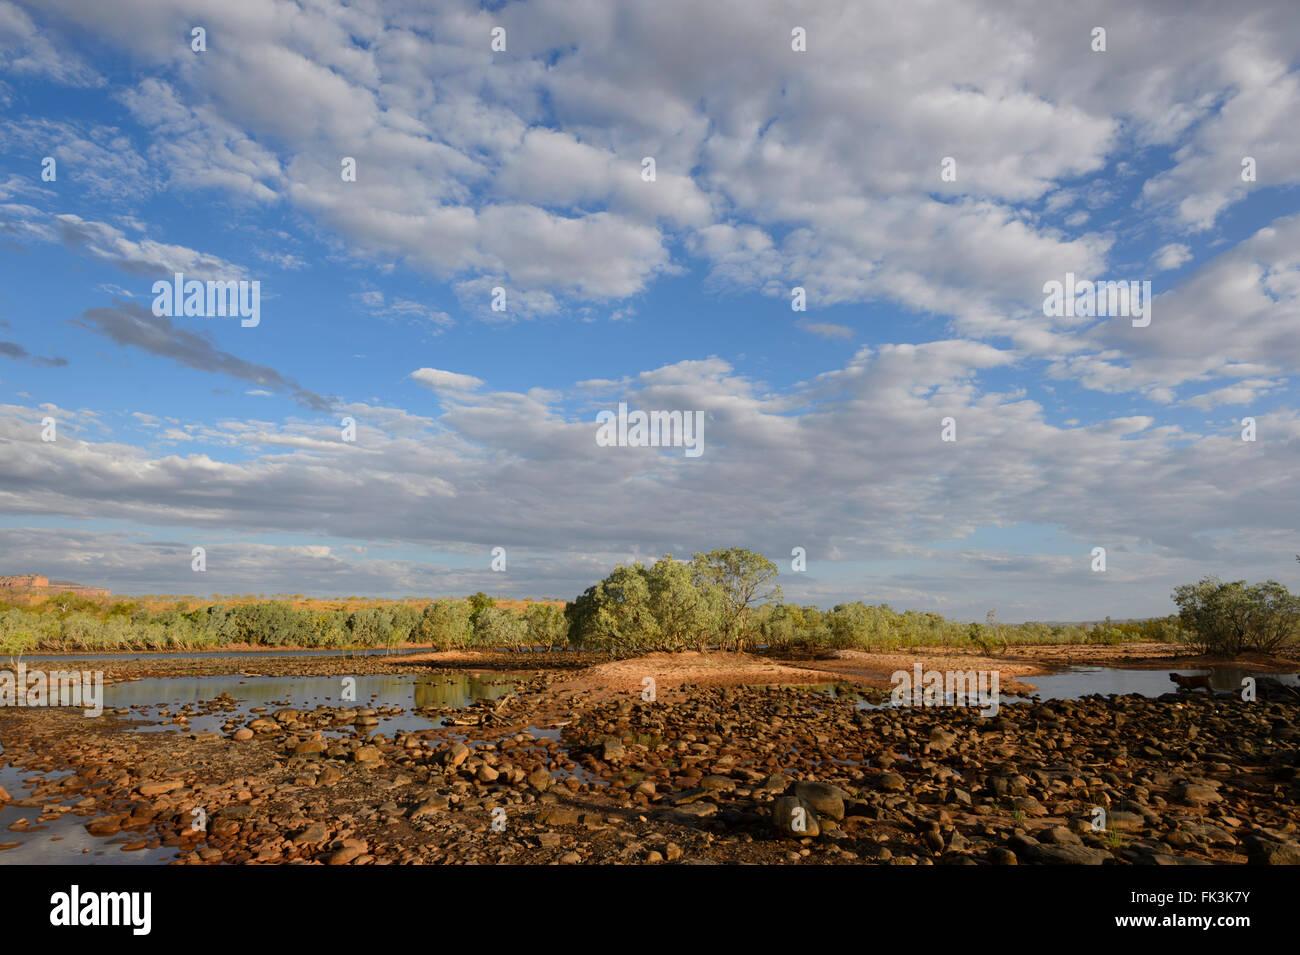 Pentecost Crossing, Kimberley Region, Western Australia, WA, Australia - Stock Image